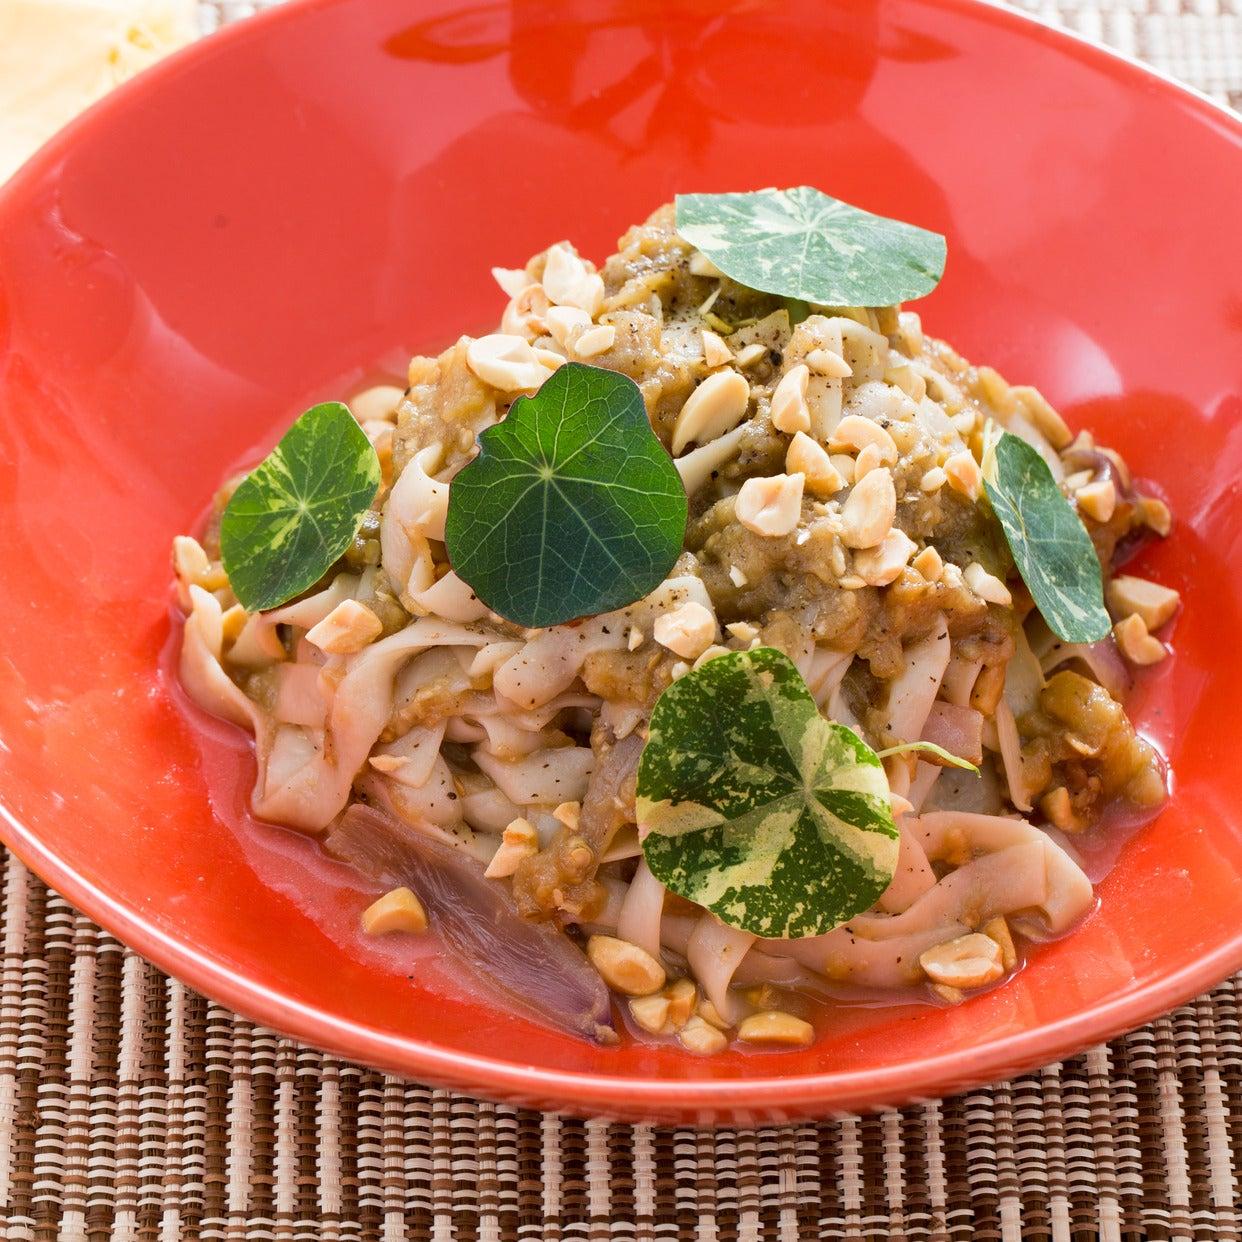 Miso Tofu Shirataki Noodles with Roasted Eggplant & Nasturtium Leaves